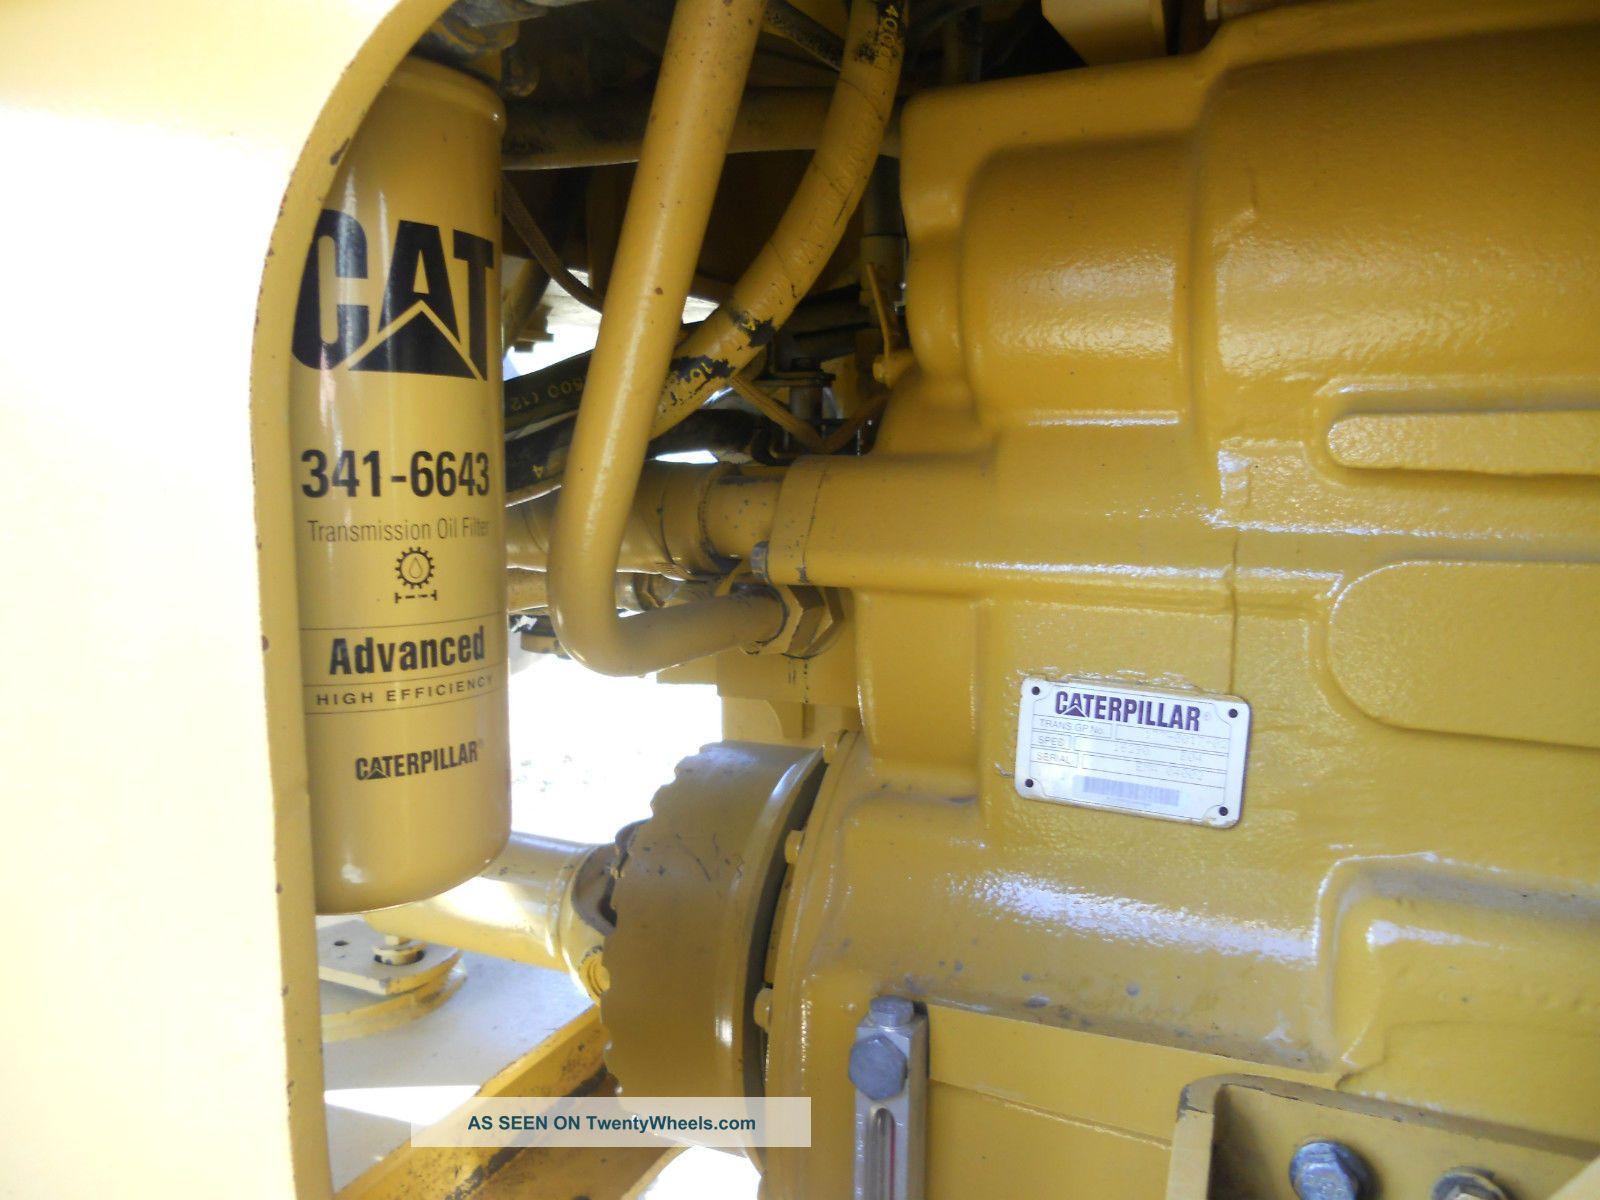 2004 Caterpillar 928g Wheel Loader Strong Runner Rebuilt Transmission